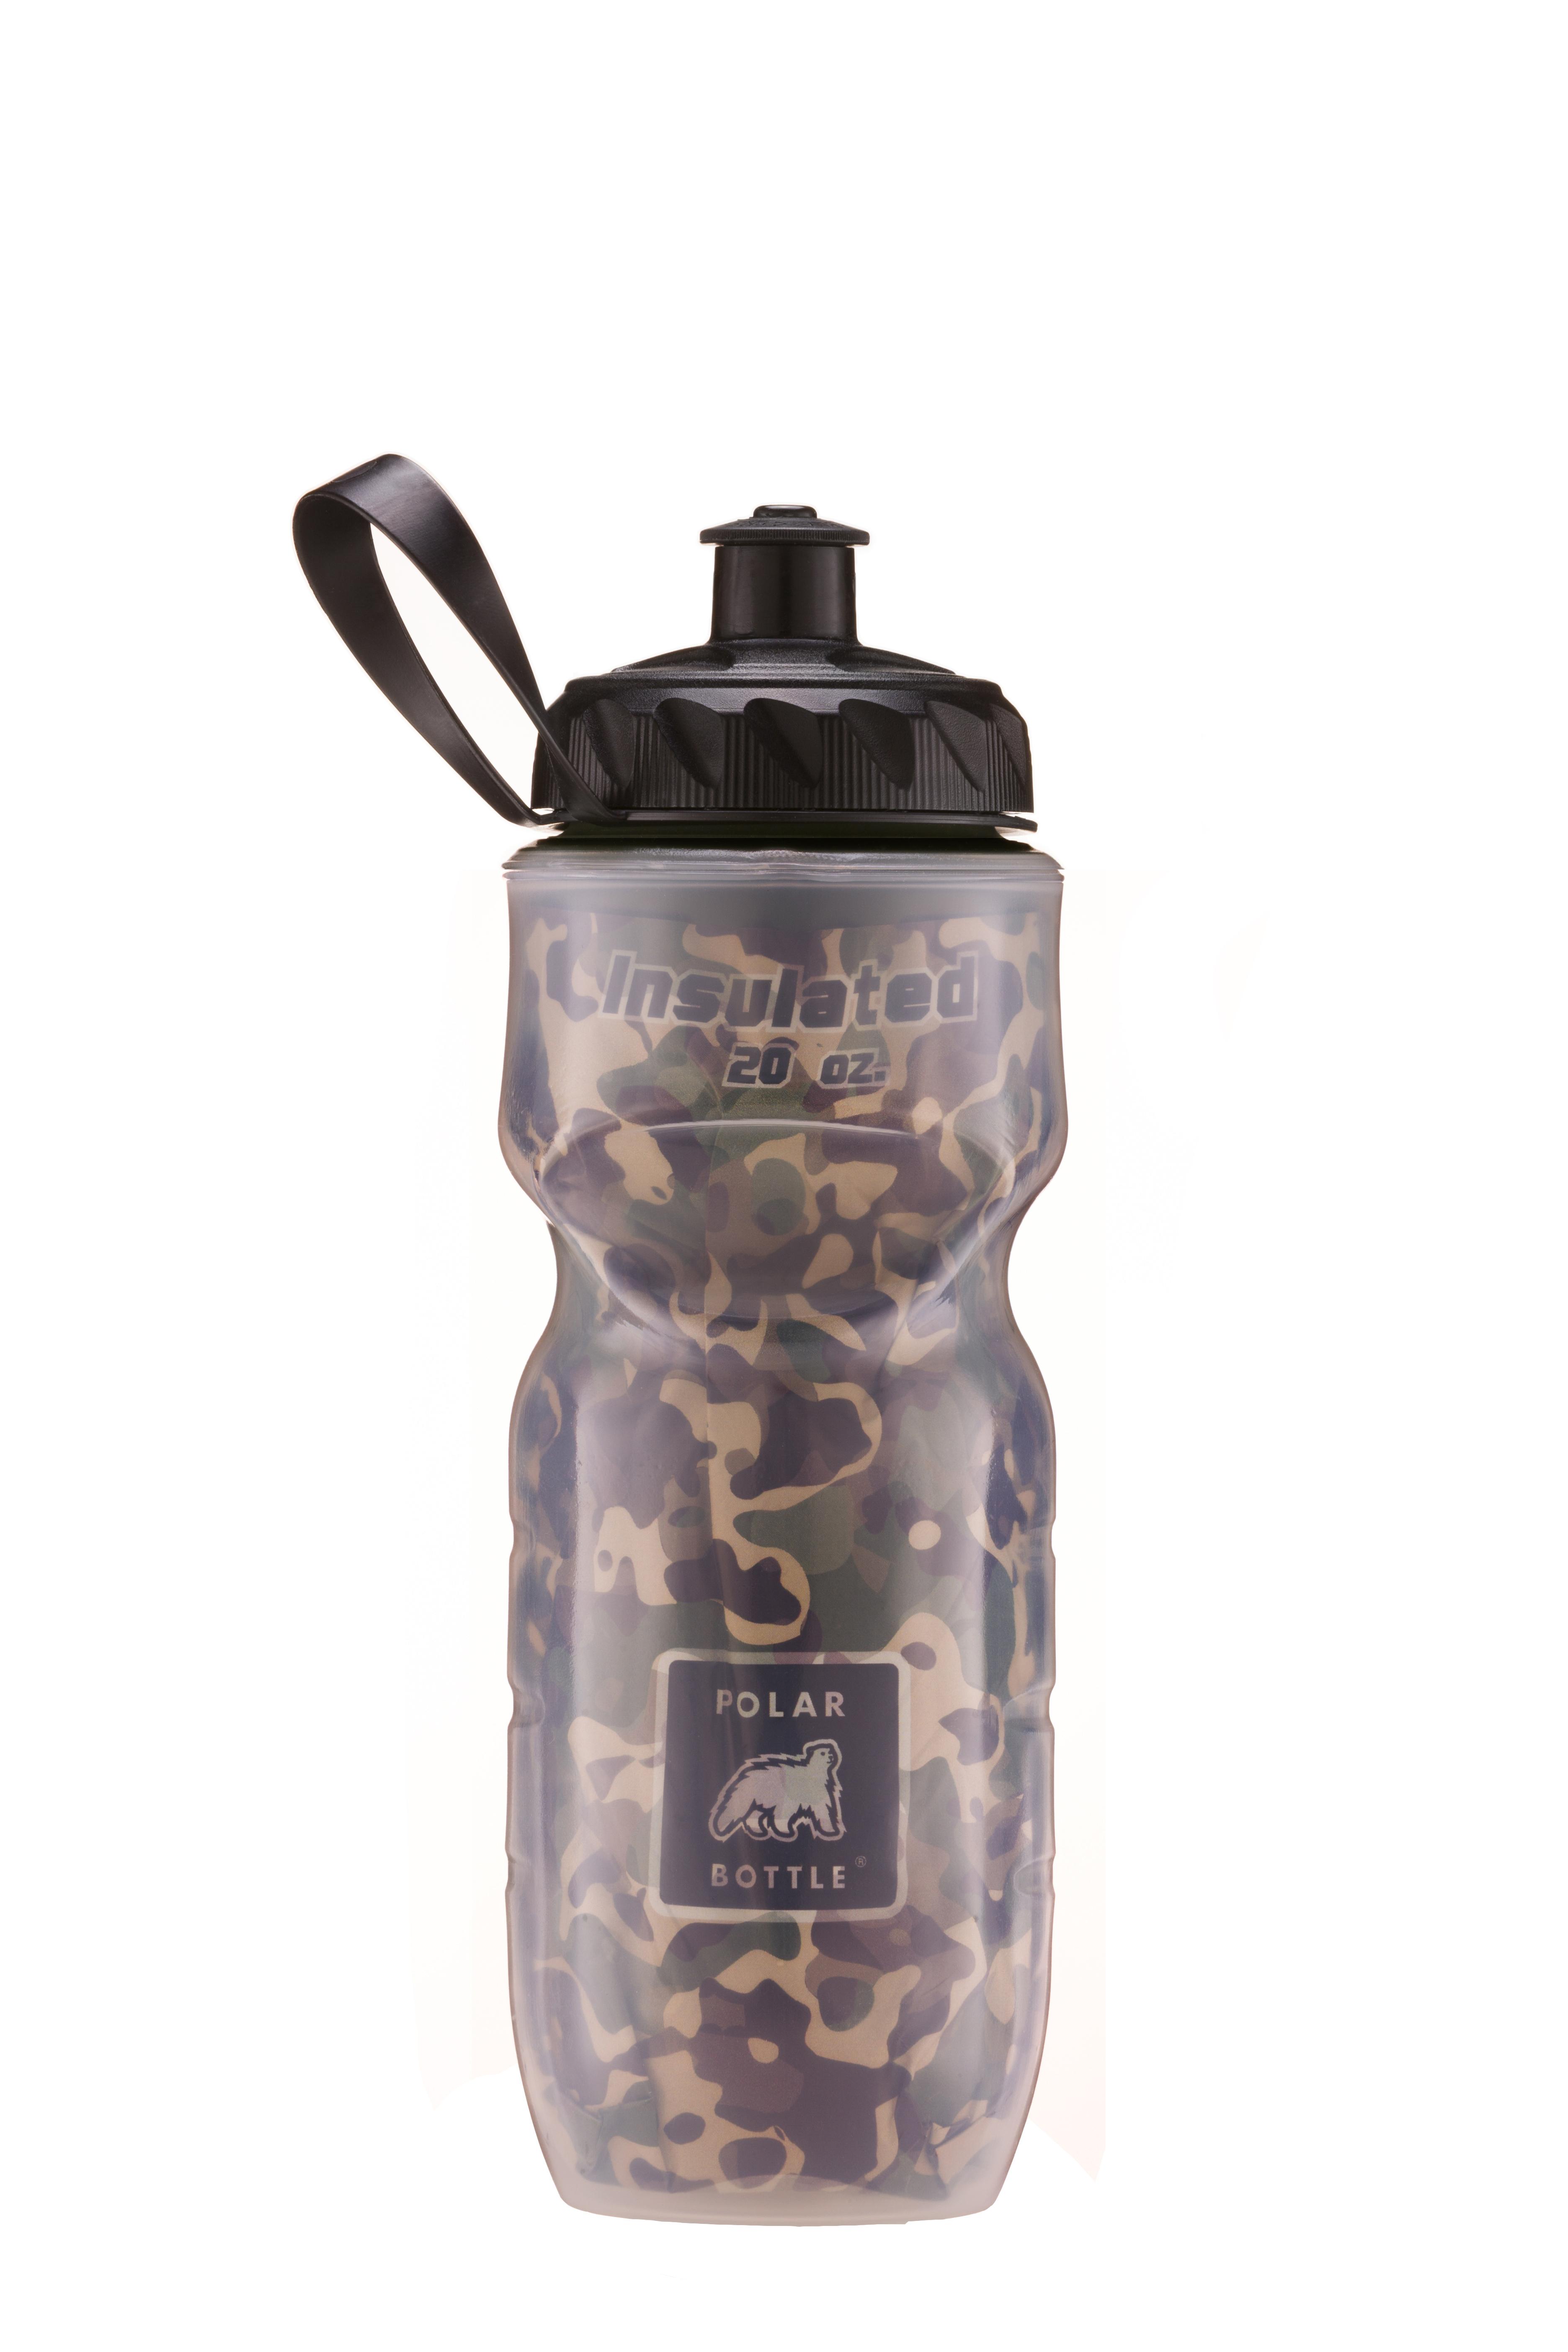 Polar Bottle Debuts New And Improved Camo Bottle Design